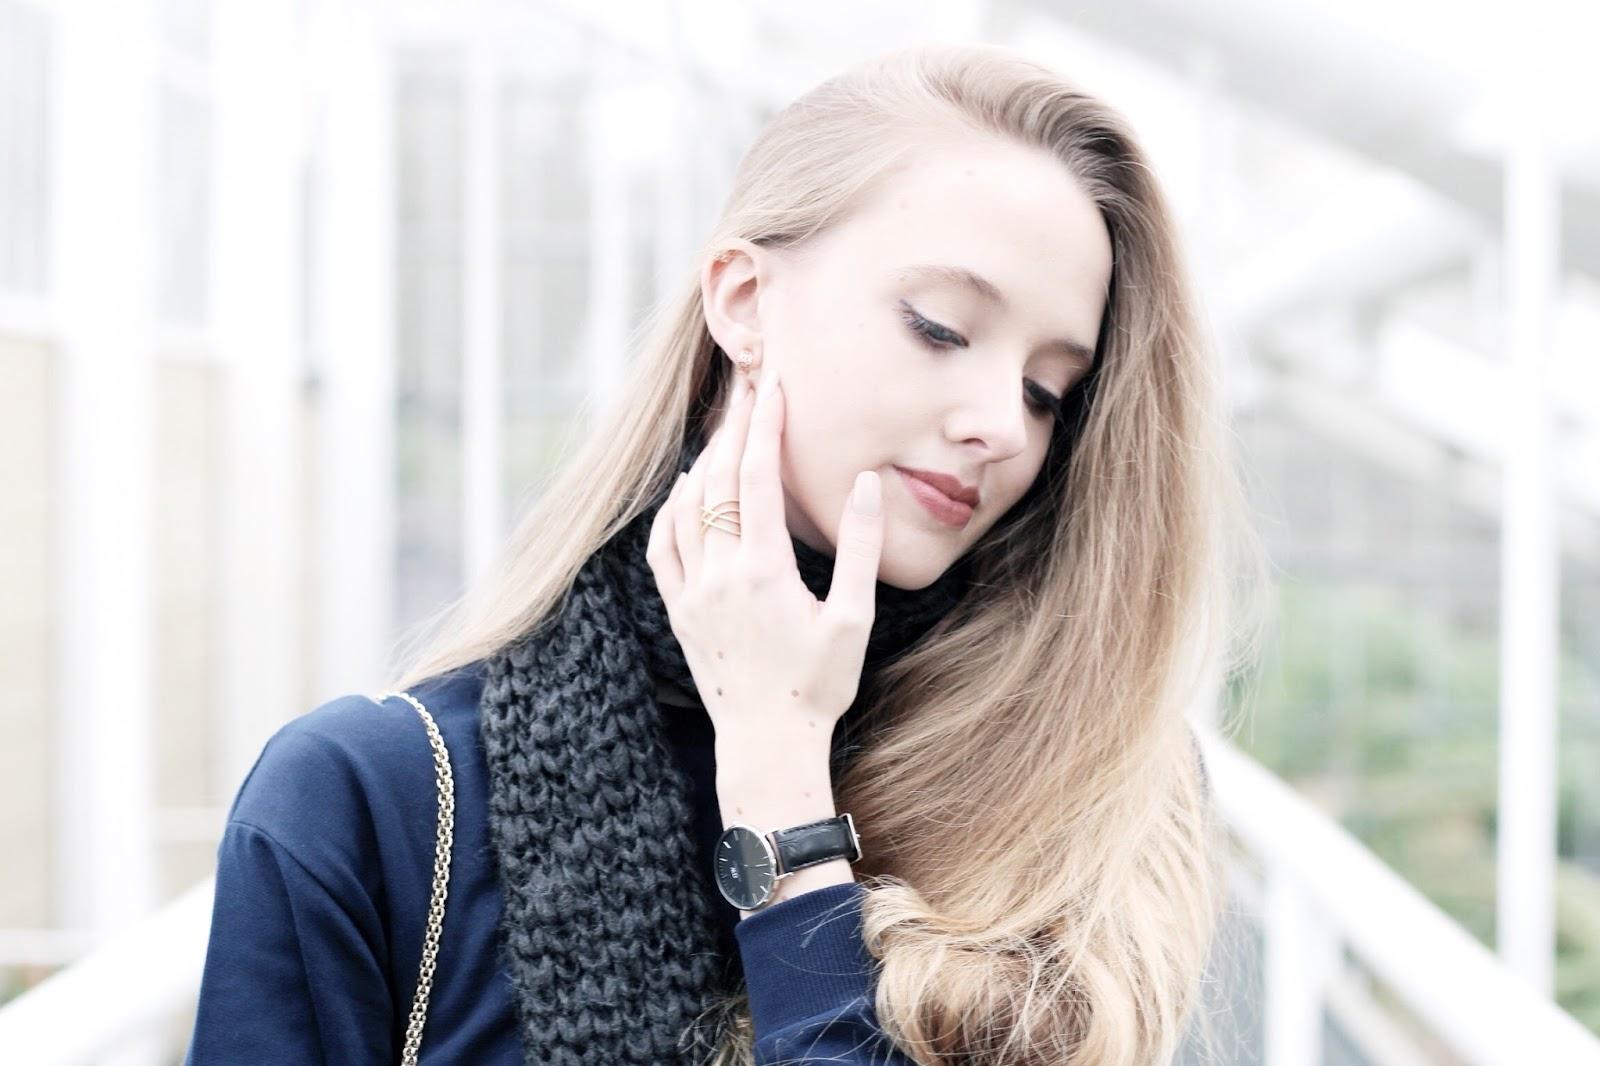 Dainty gold ear cuffs by Accessorize